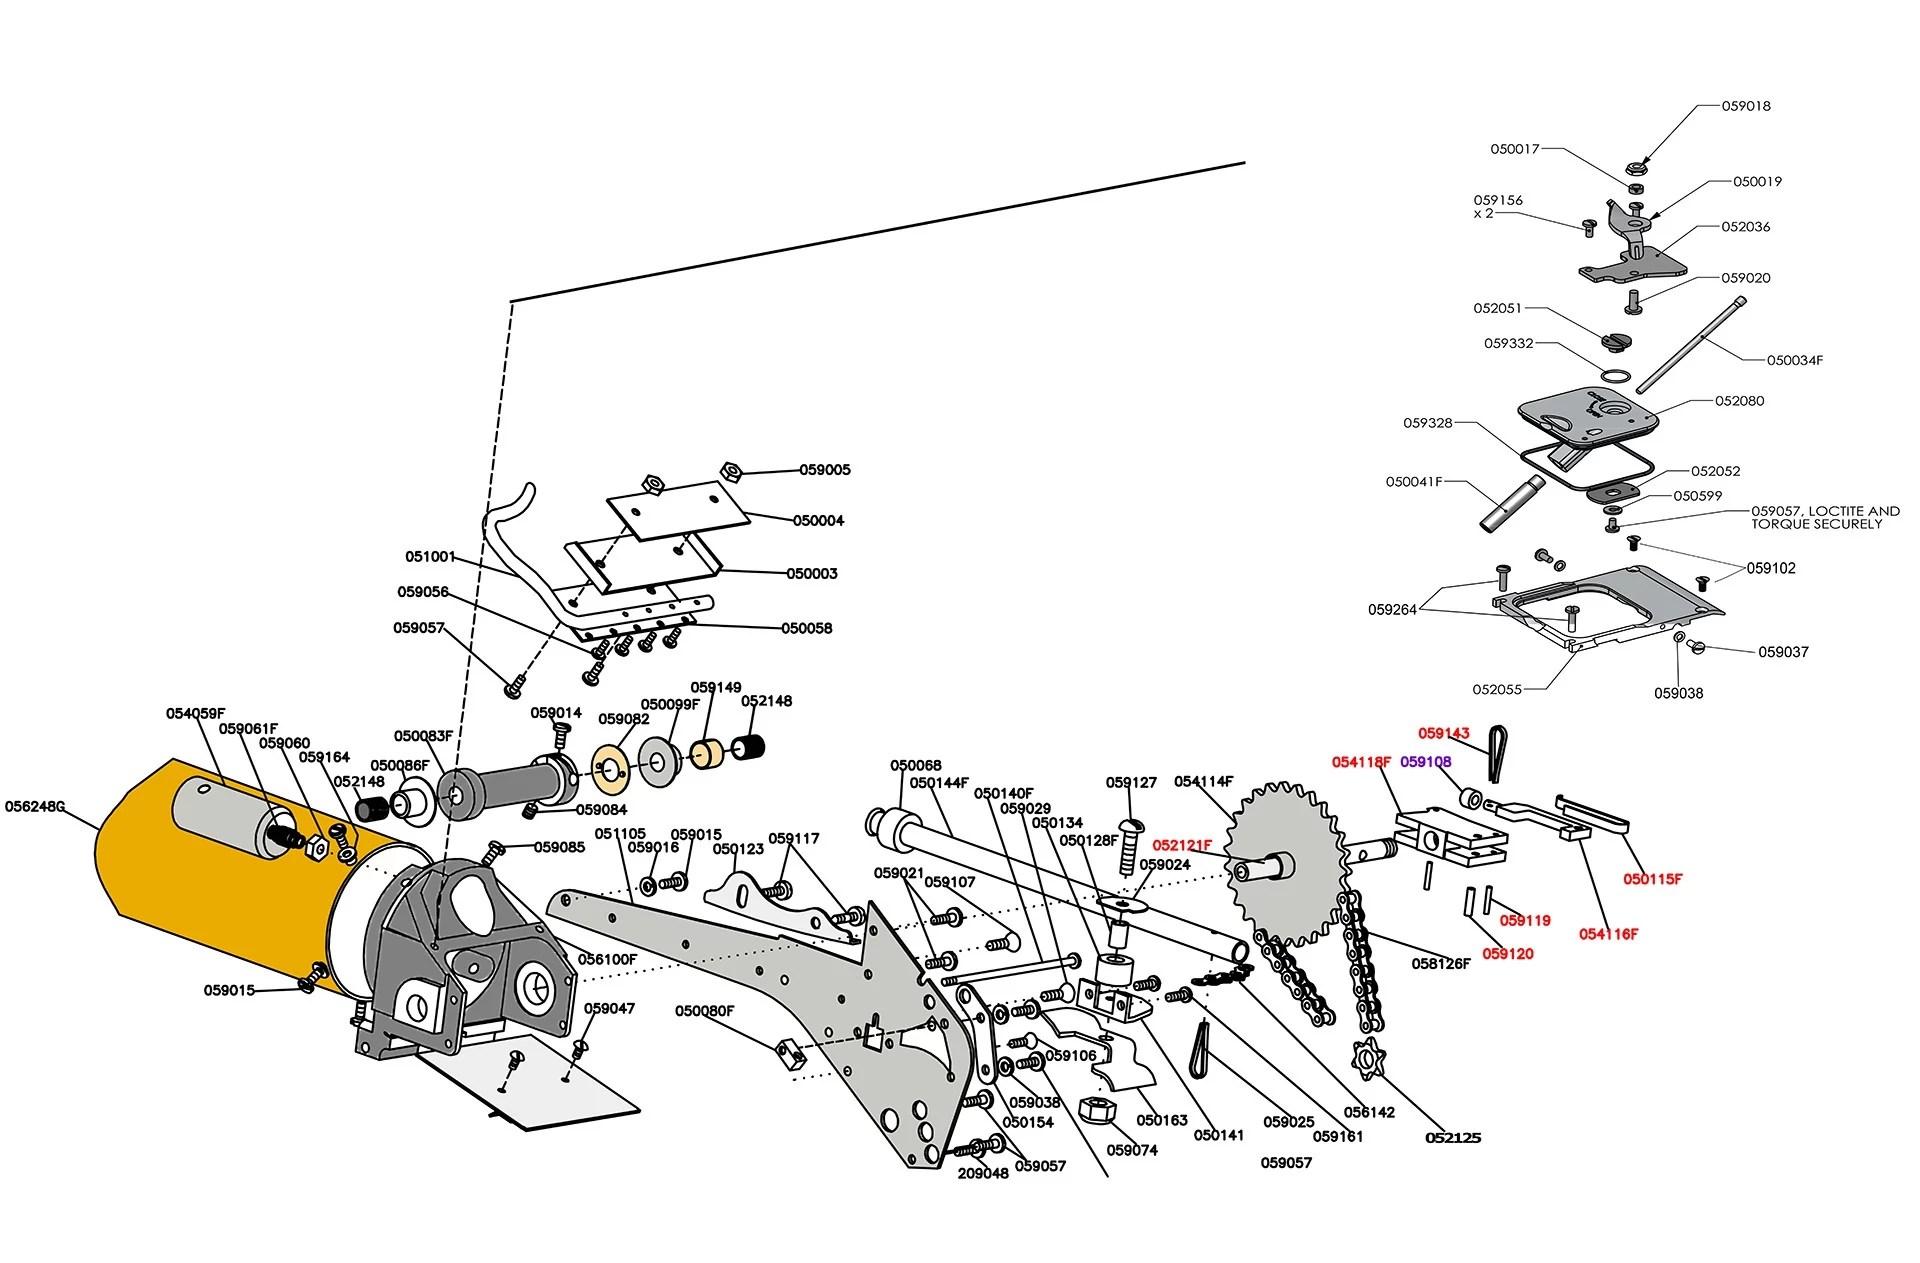 33 Tapetech Bazooka Parts Diagram